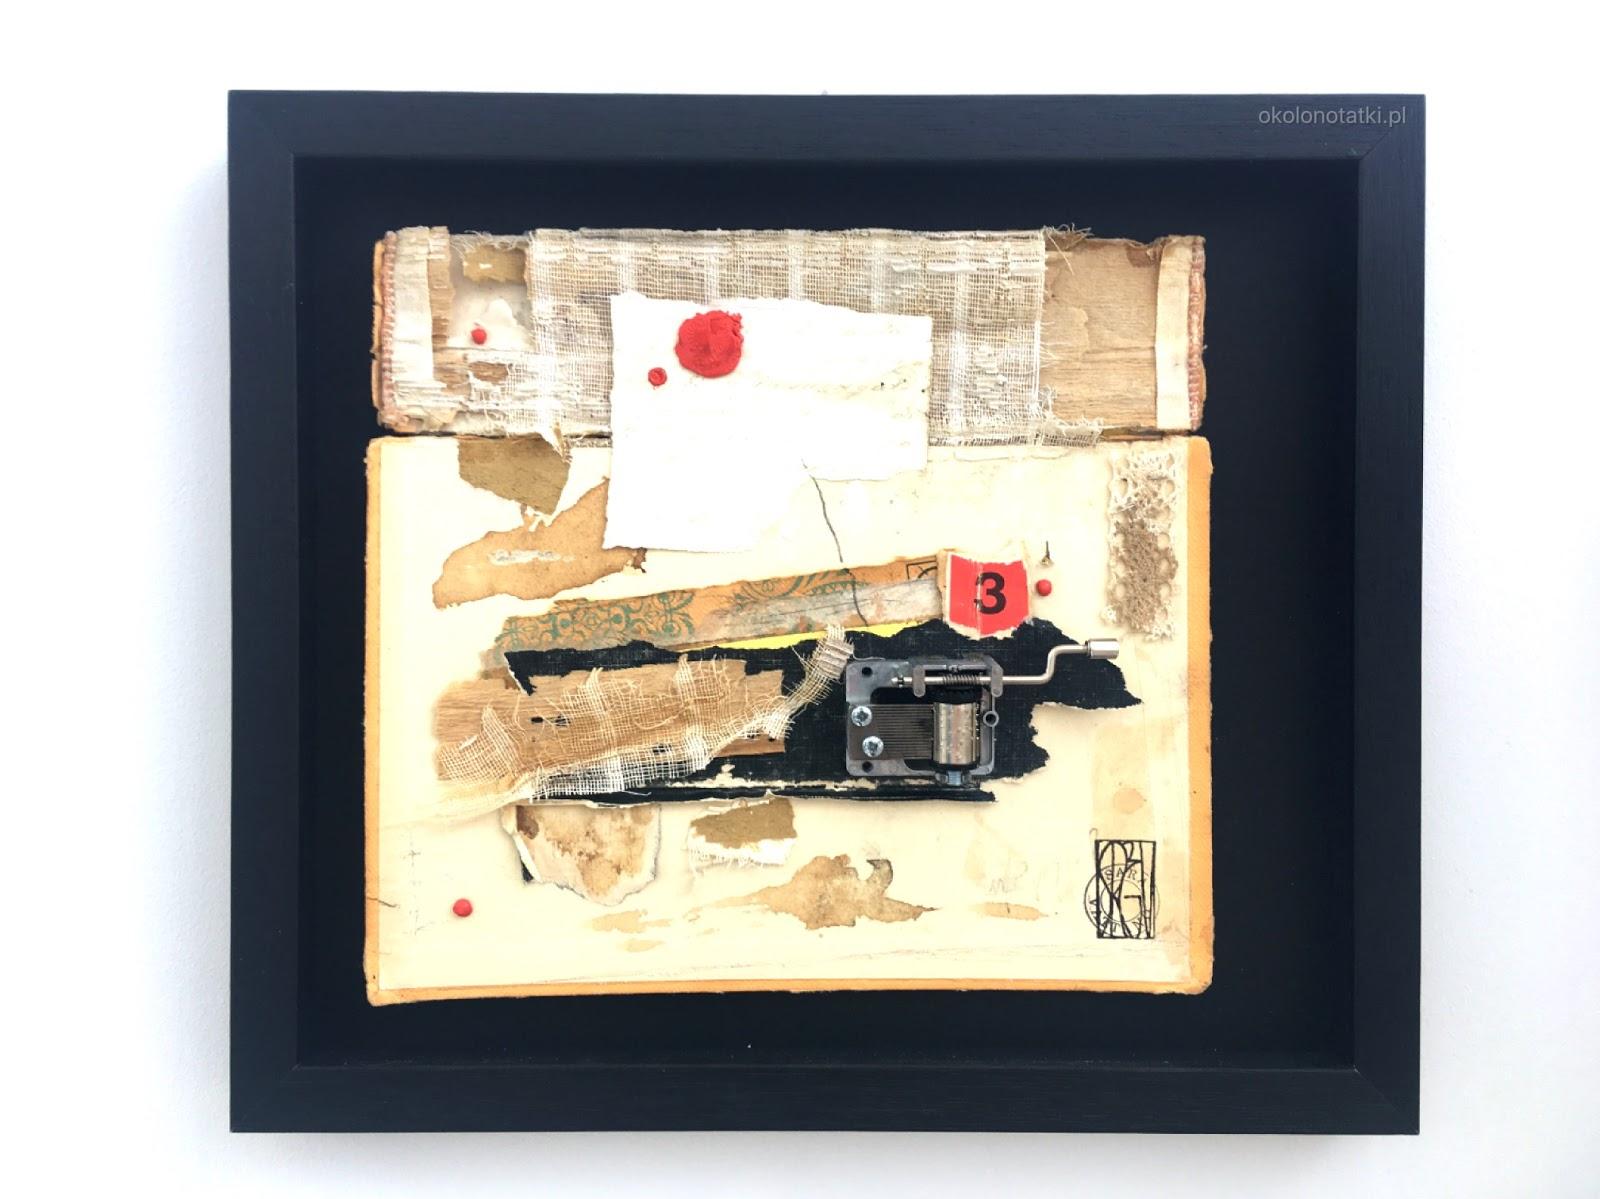 Sara Vattano abstract collage art